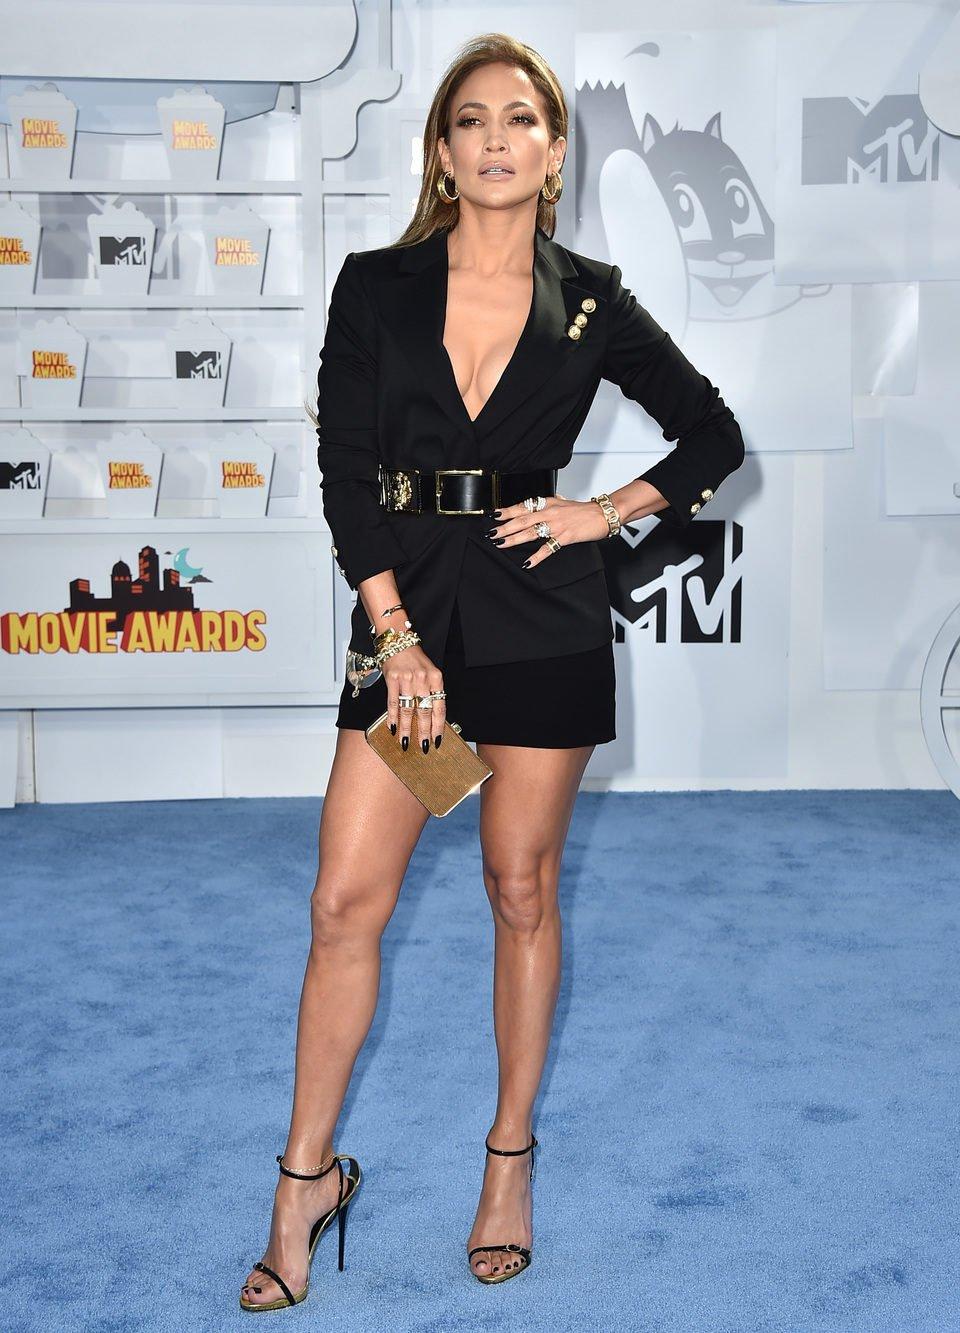 Jennifer Lopez Photos - The 2015 MTV Movie Awards - Red